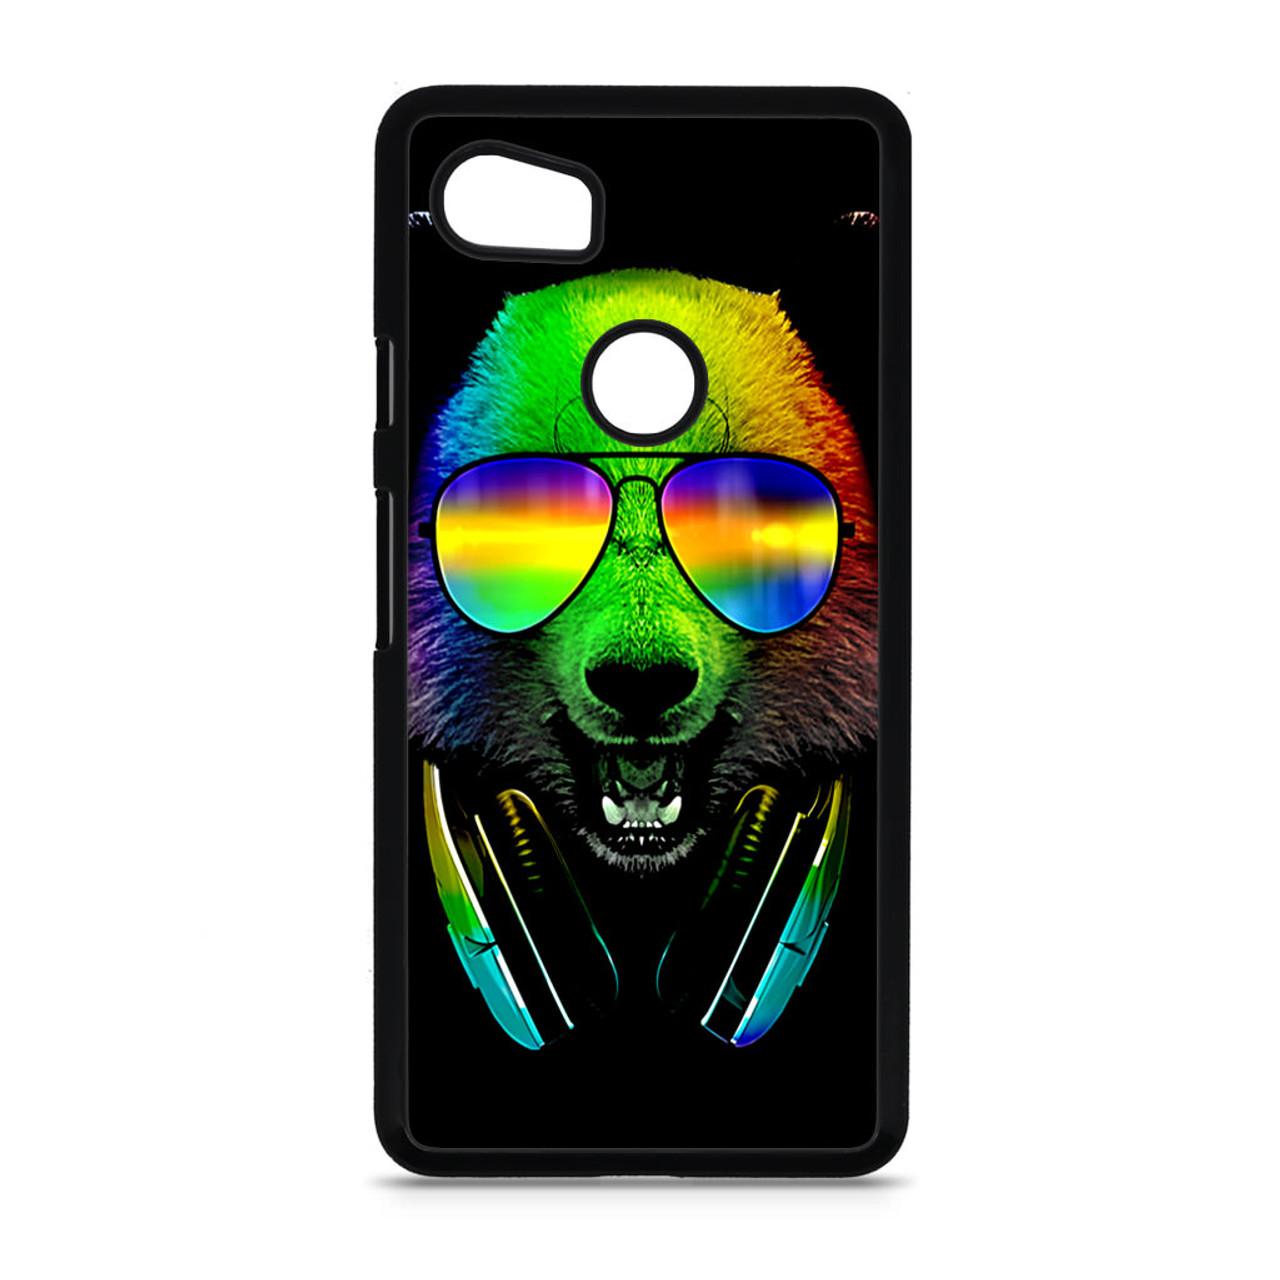 detailed look 5c5e4 cf57b Dj Panda Google Pixel 2 XL Case